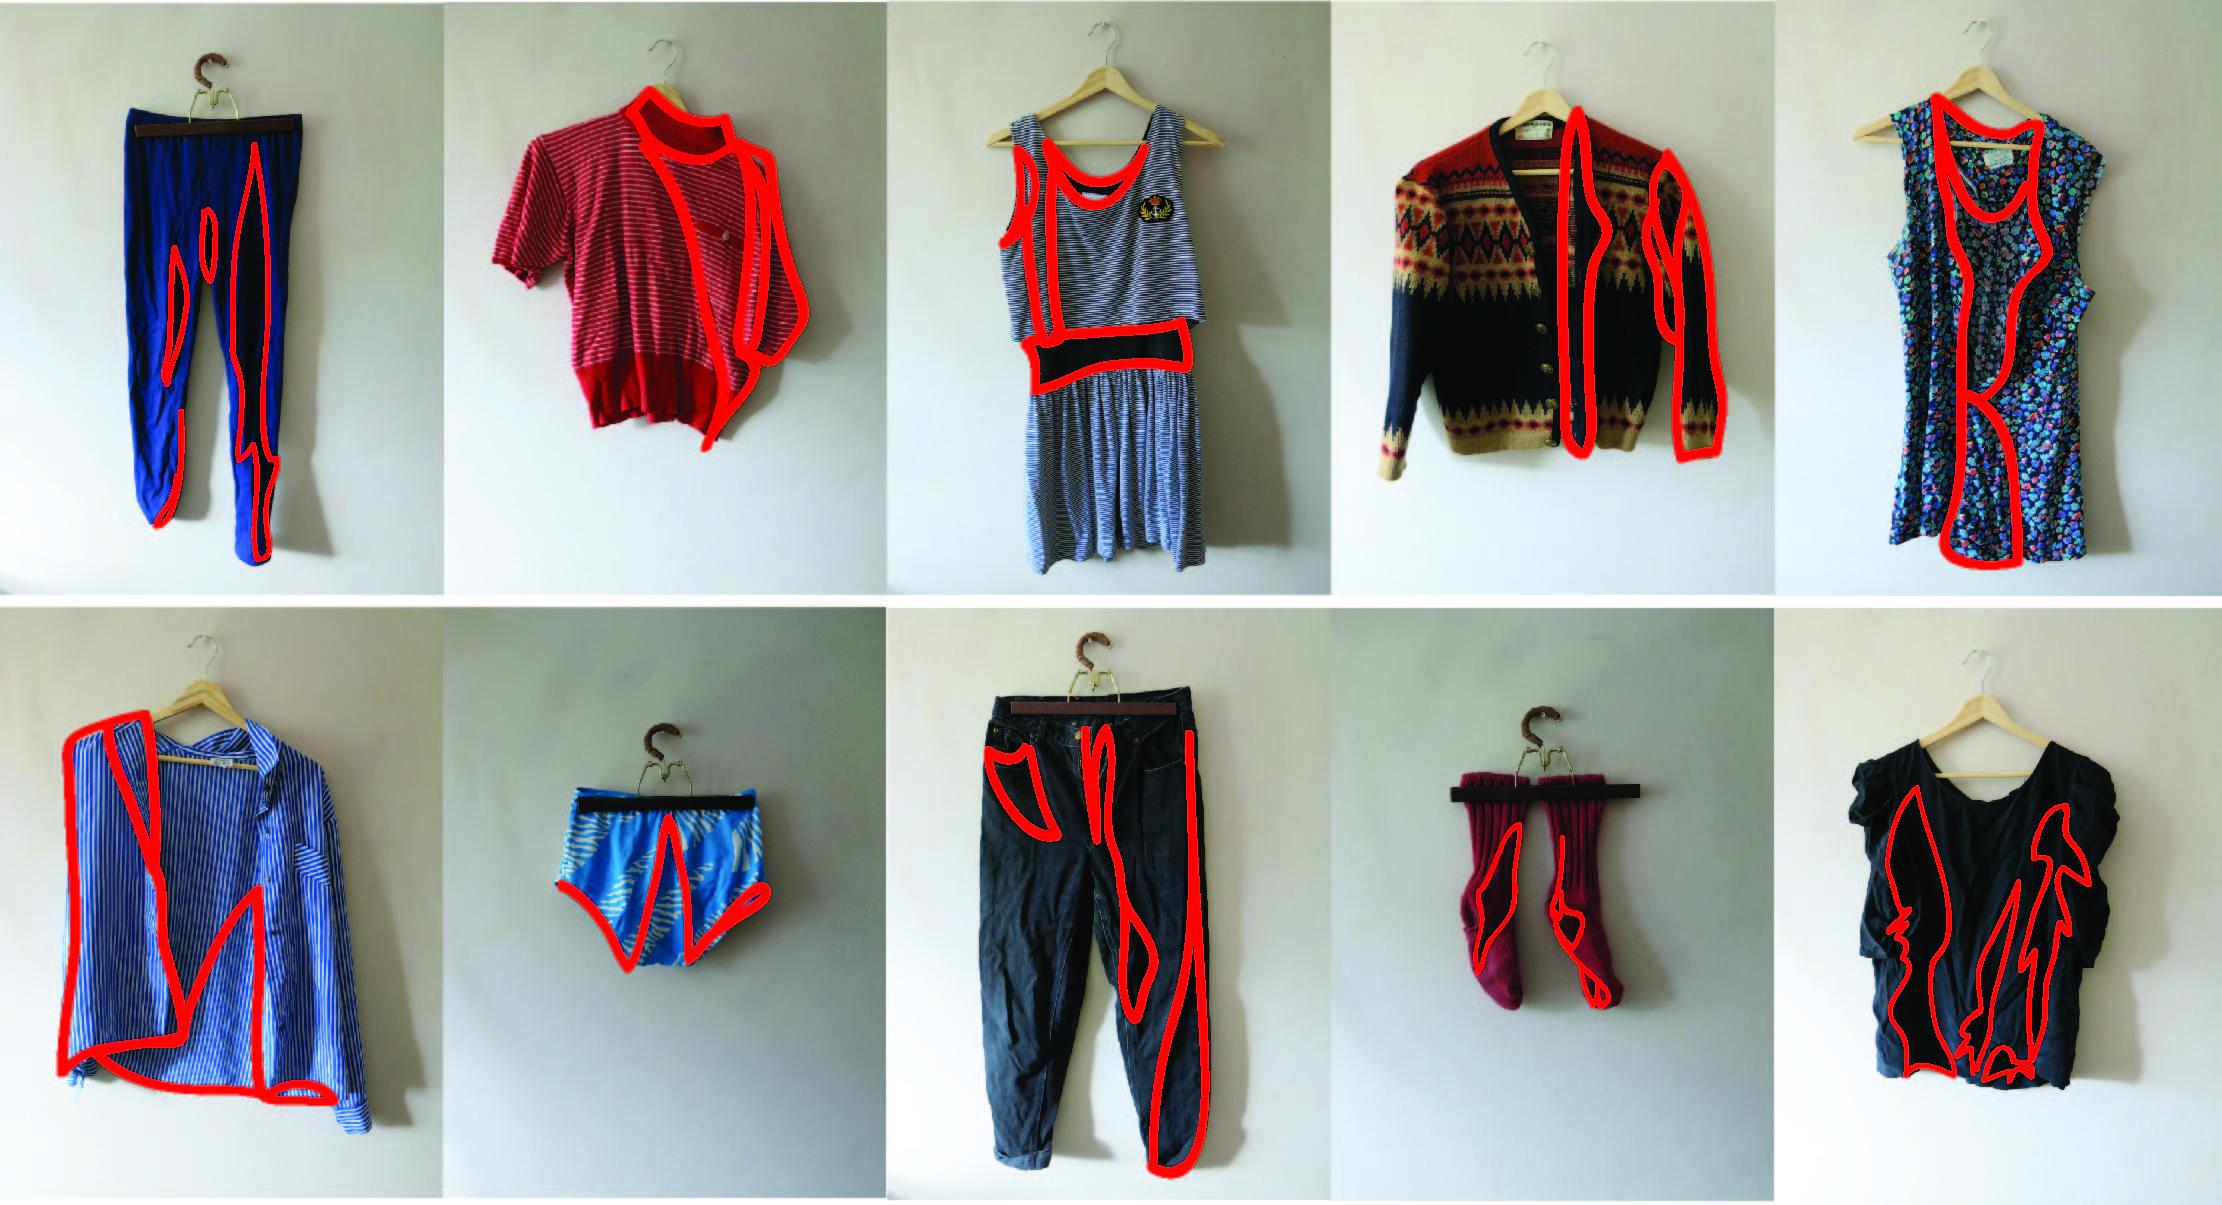 05-clothingabstractions.jpg